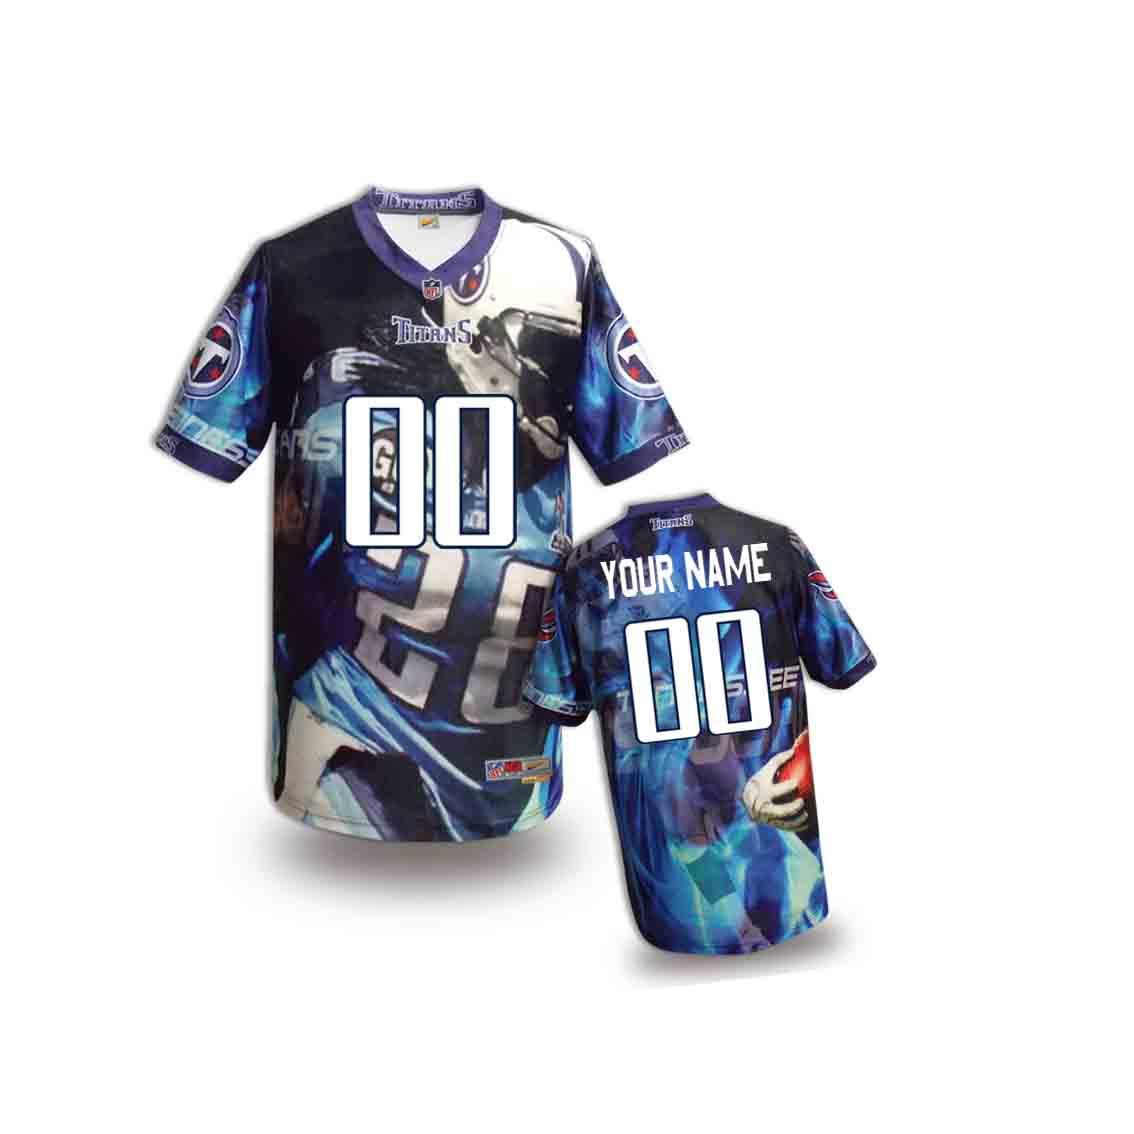 Nike Titans Customized Fashion Stitched Youth Jerseys06